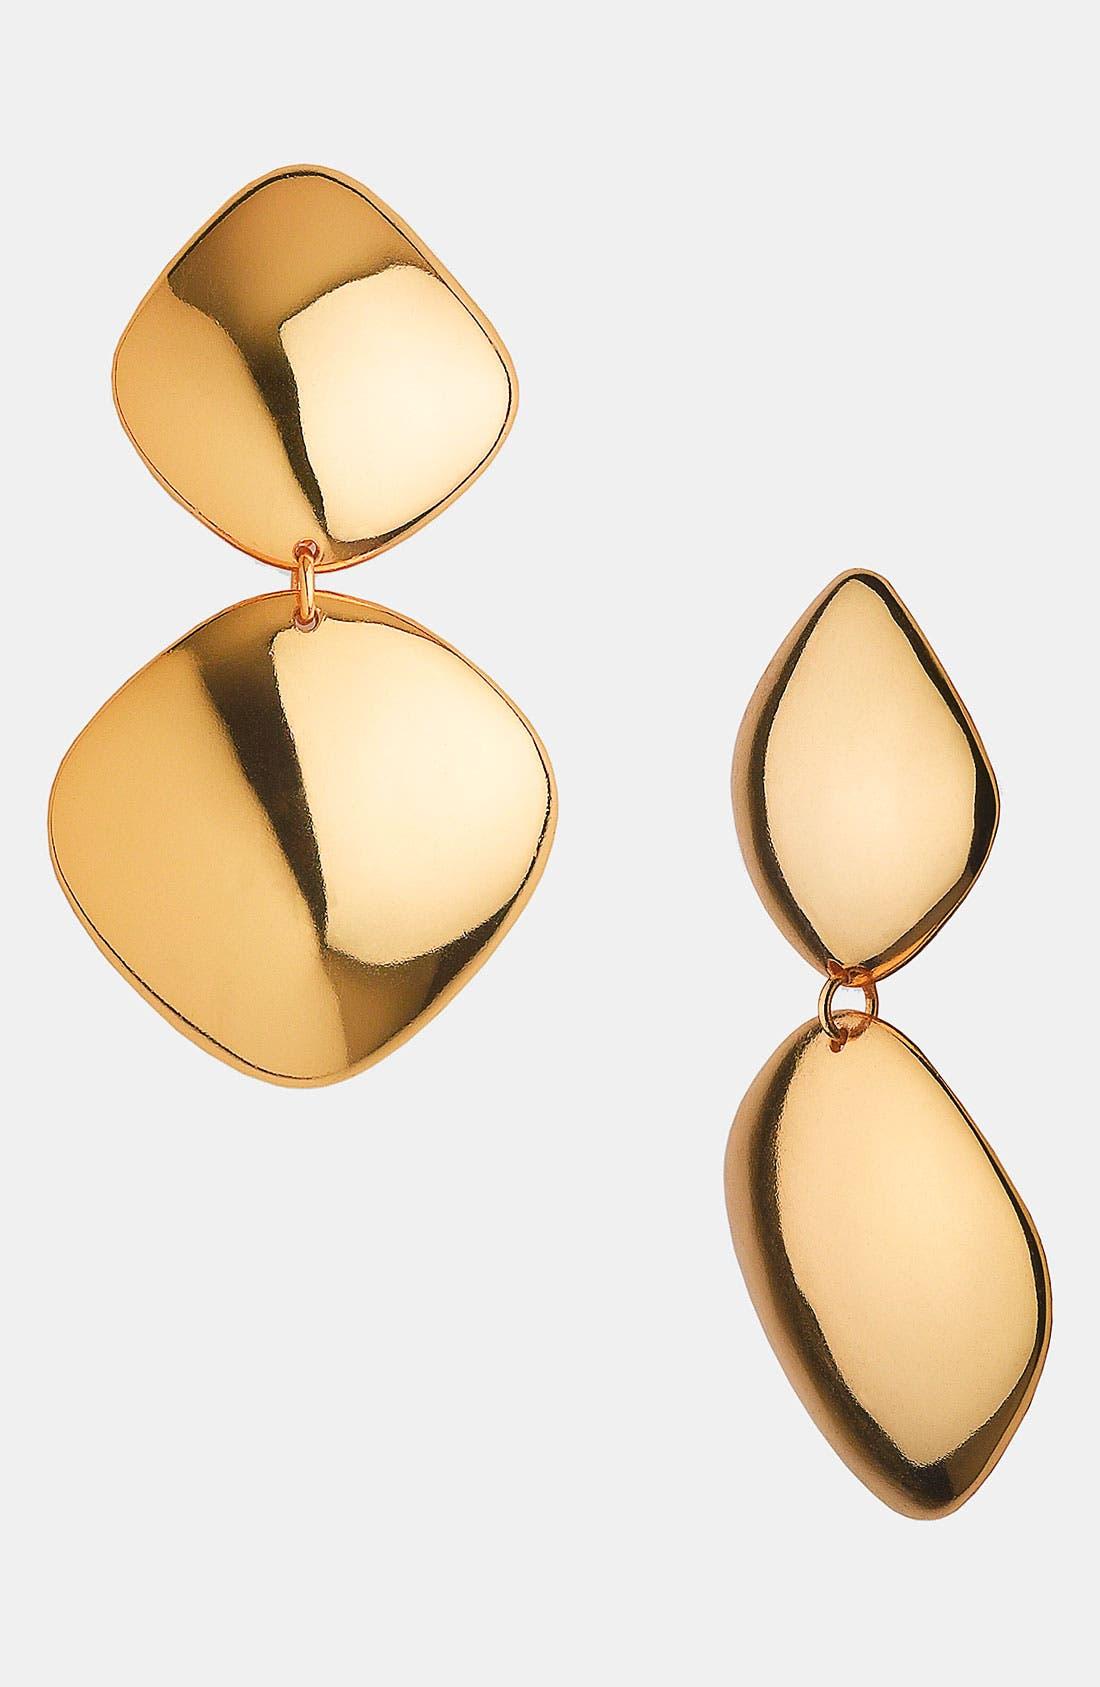 Alternate Image 1 Selected - Argento Vivo 'Metropolis' Drop Clip Earrings (Nordstrom Exclusive)